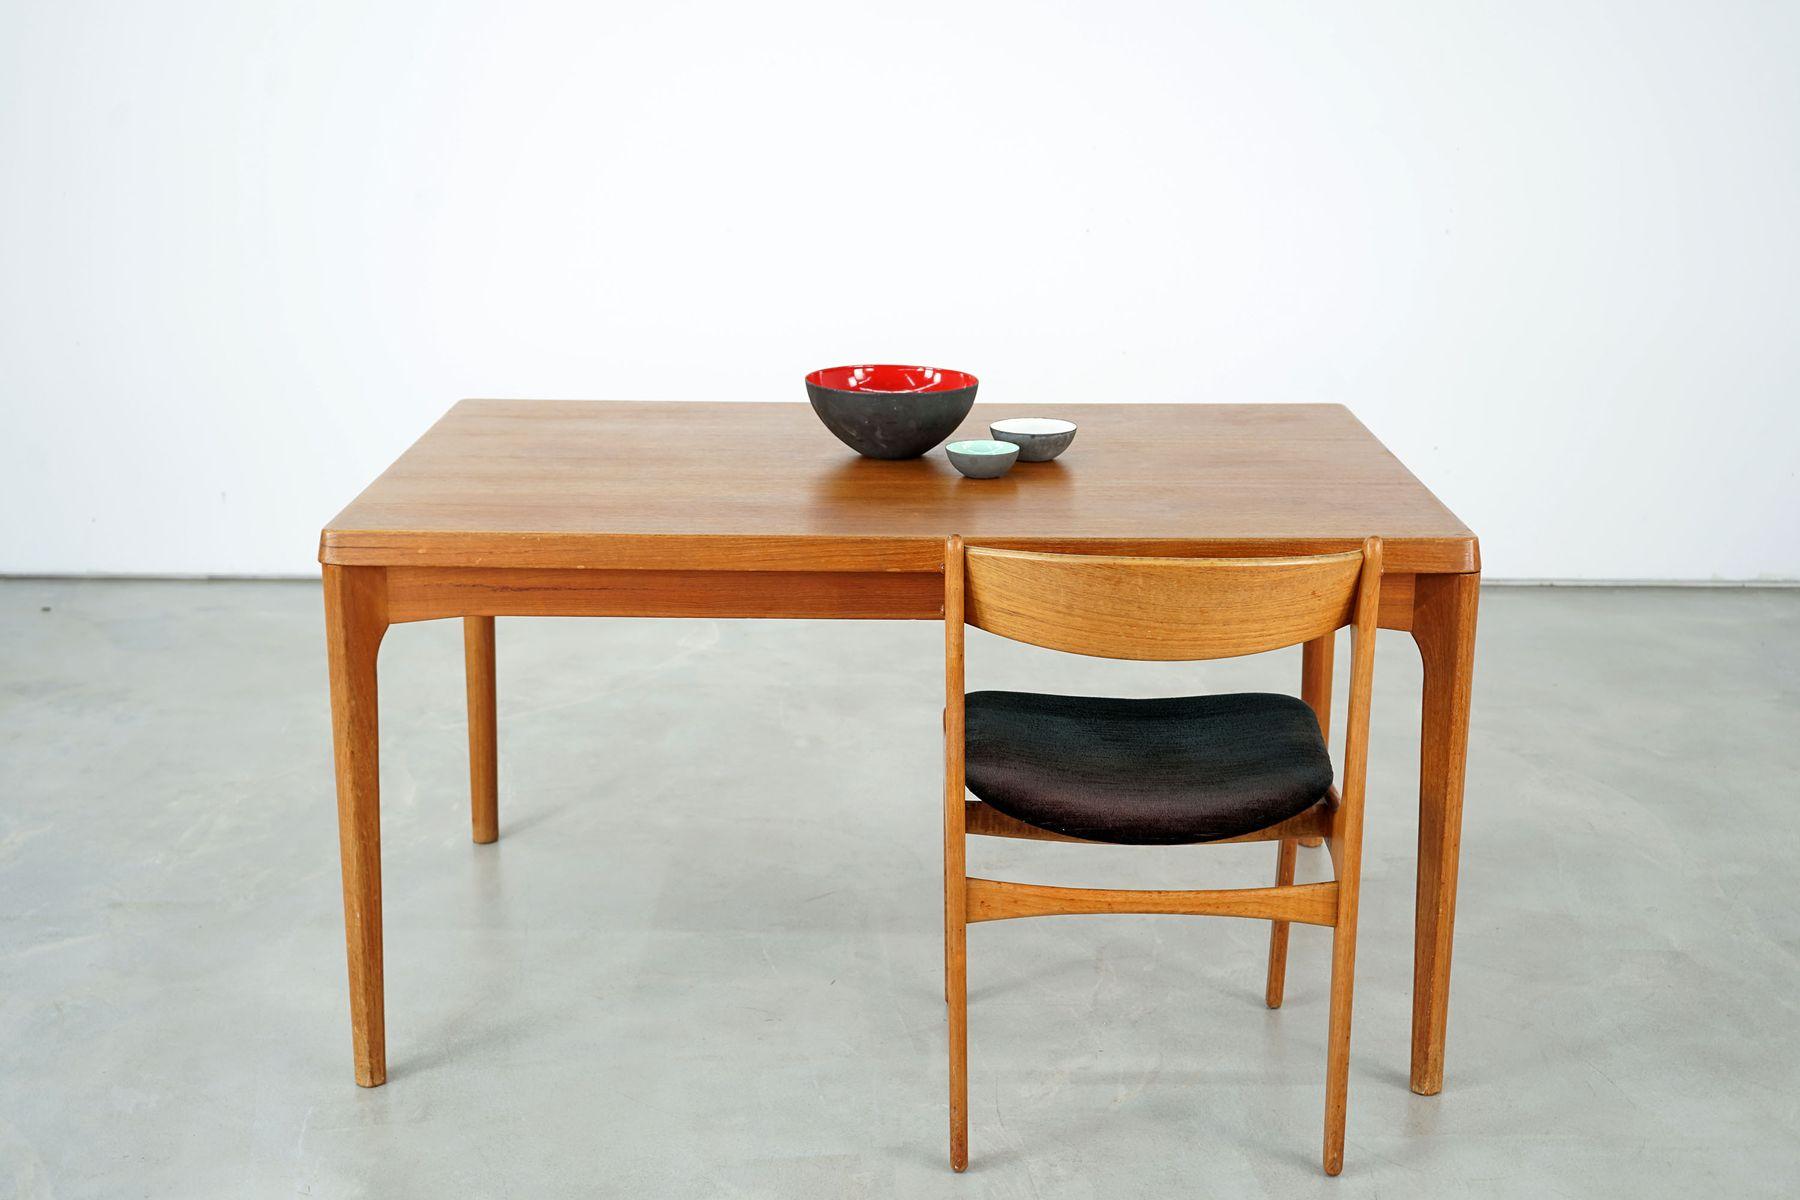 gro er esstisch von henning kjaernulf f r vejle. Black Bedroom Furniture Sets. Home Design Ideas